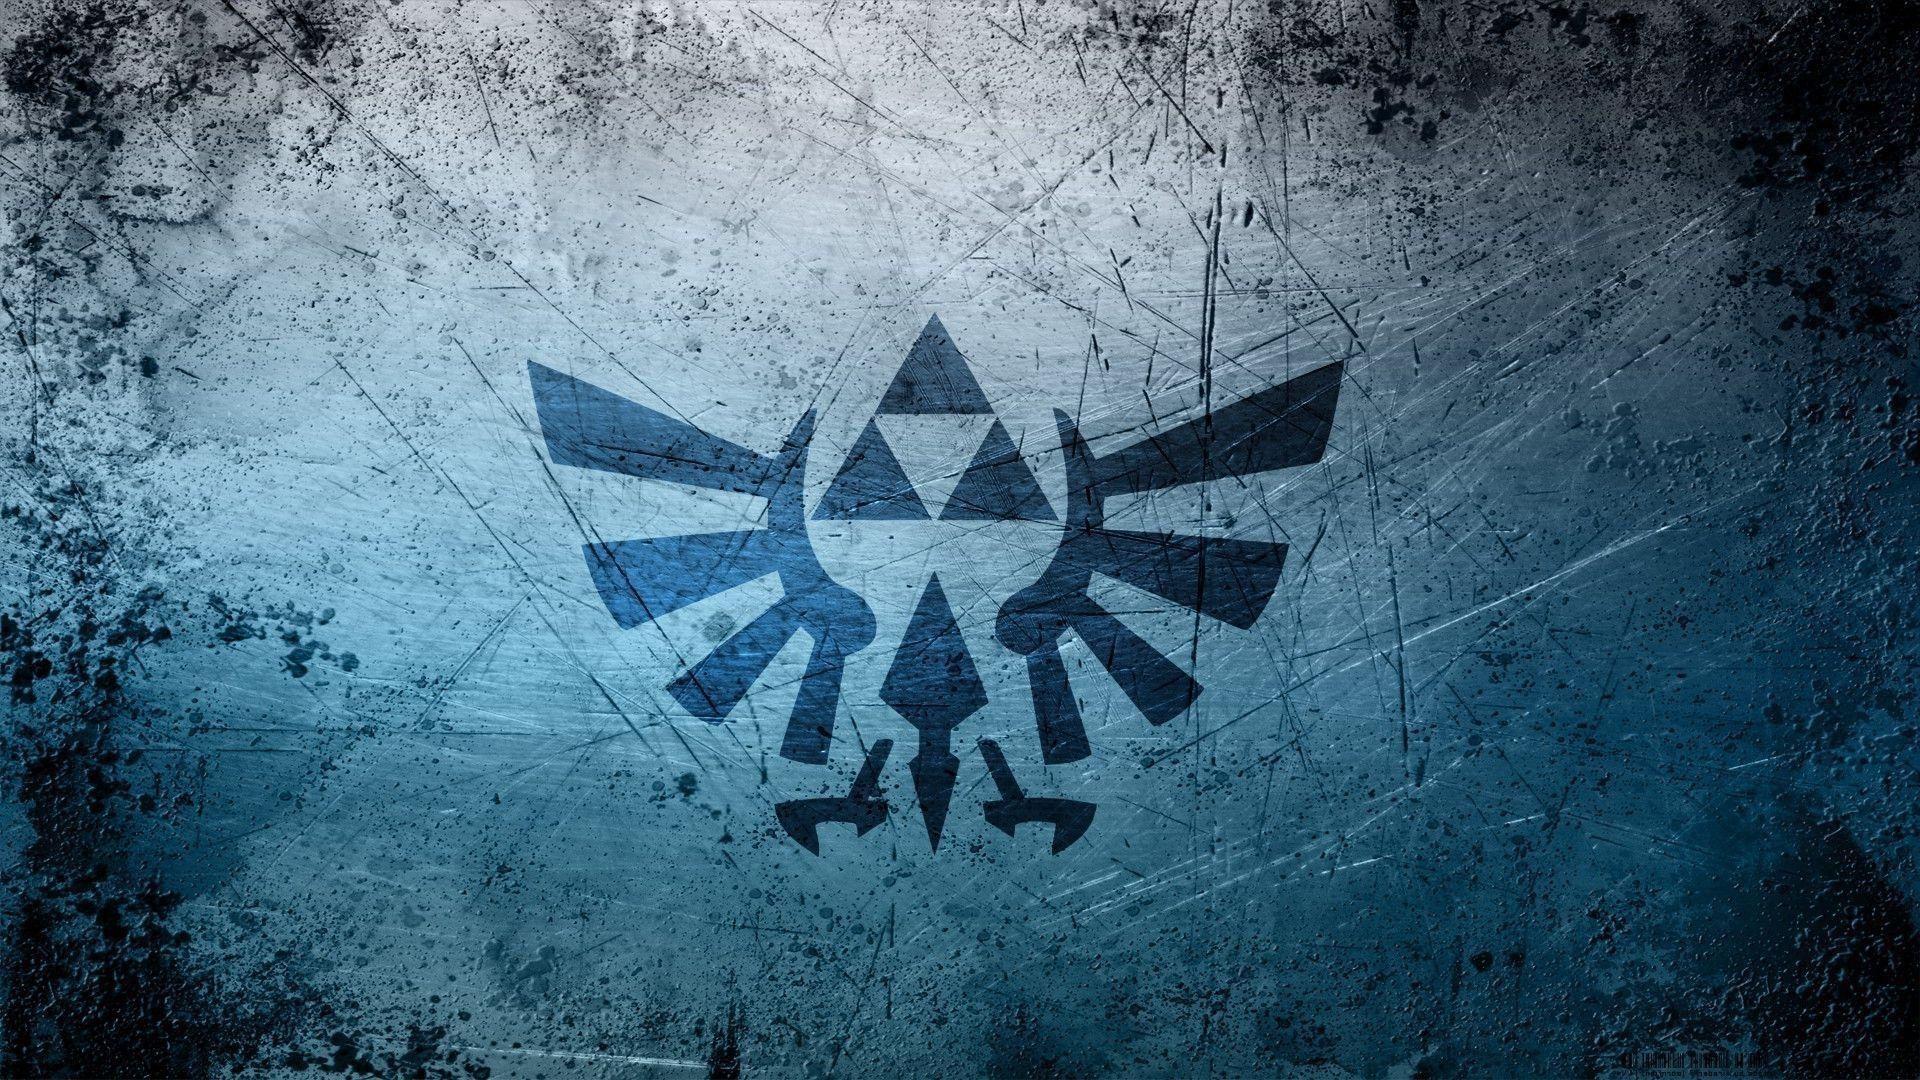 10 New Legend Of Zelda 1920x1080 Wallpaper Full Hd 1920 1080 For